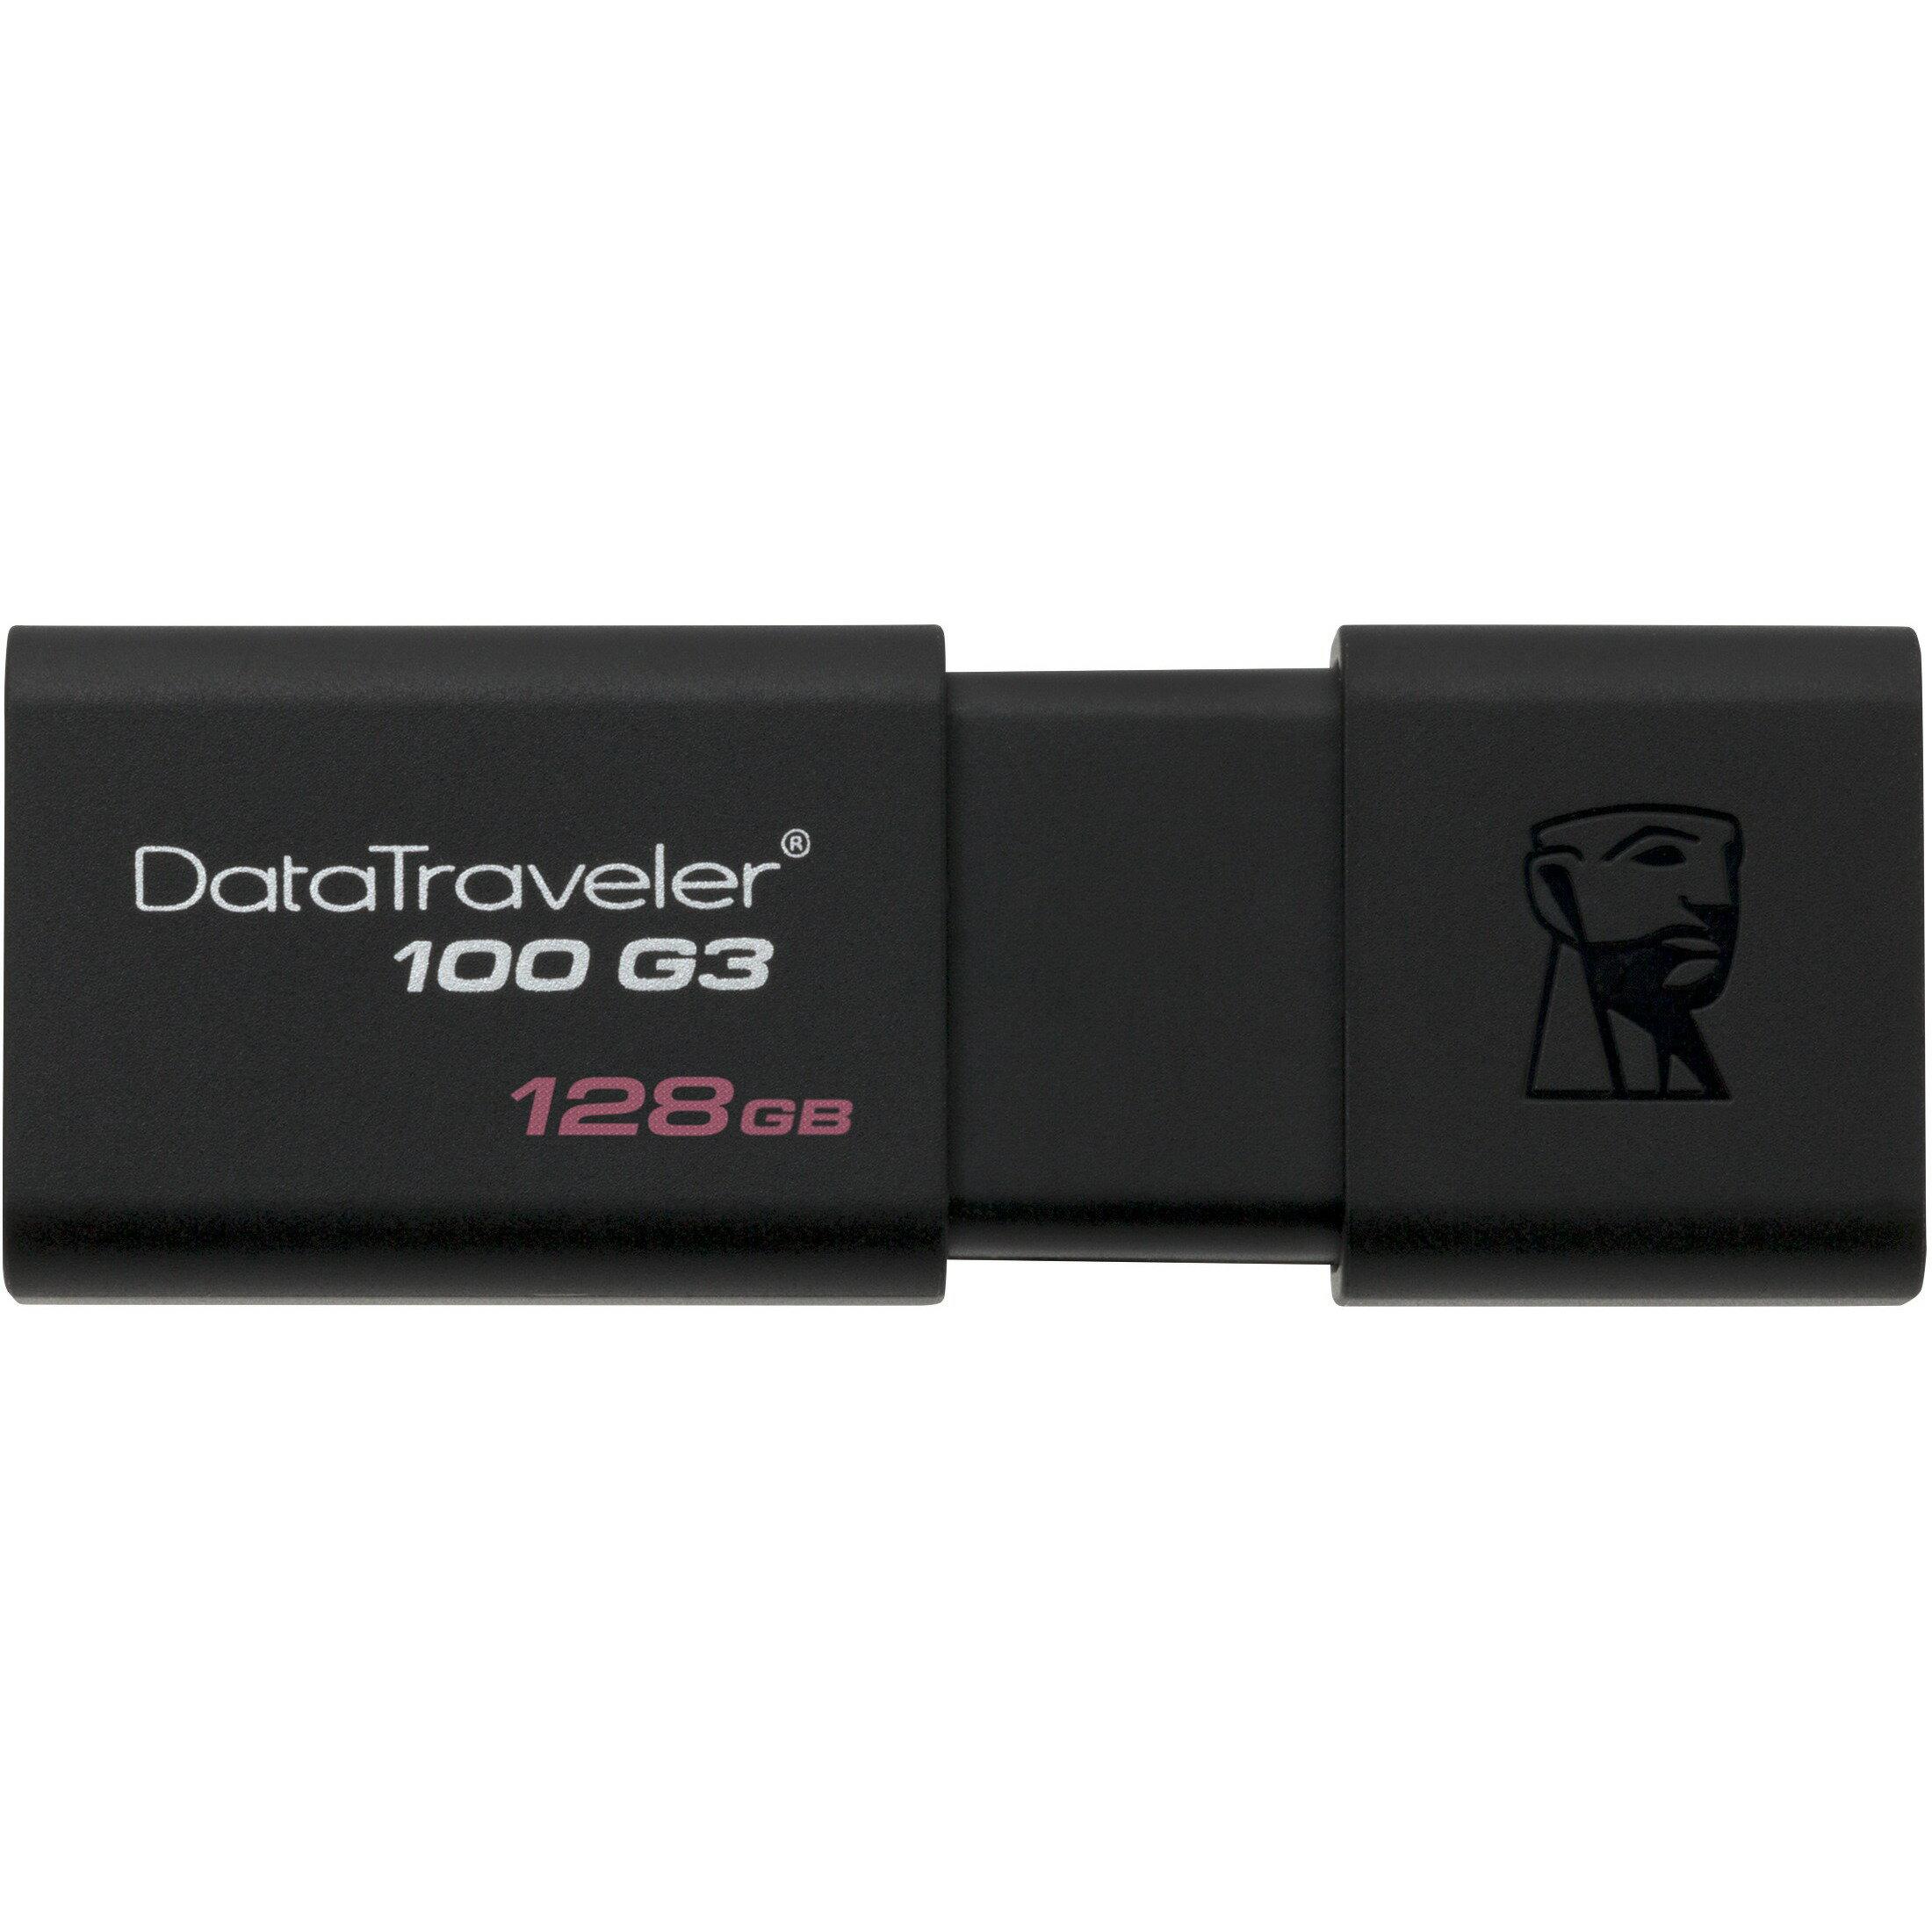 Kingston 128GB DataTraveler 100 G3 128G USB 3.0 100MB/s DT100G3 Flash Pen Thumb Drive DT100G3/128GB 2